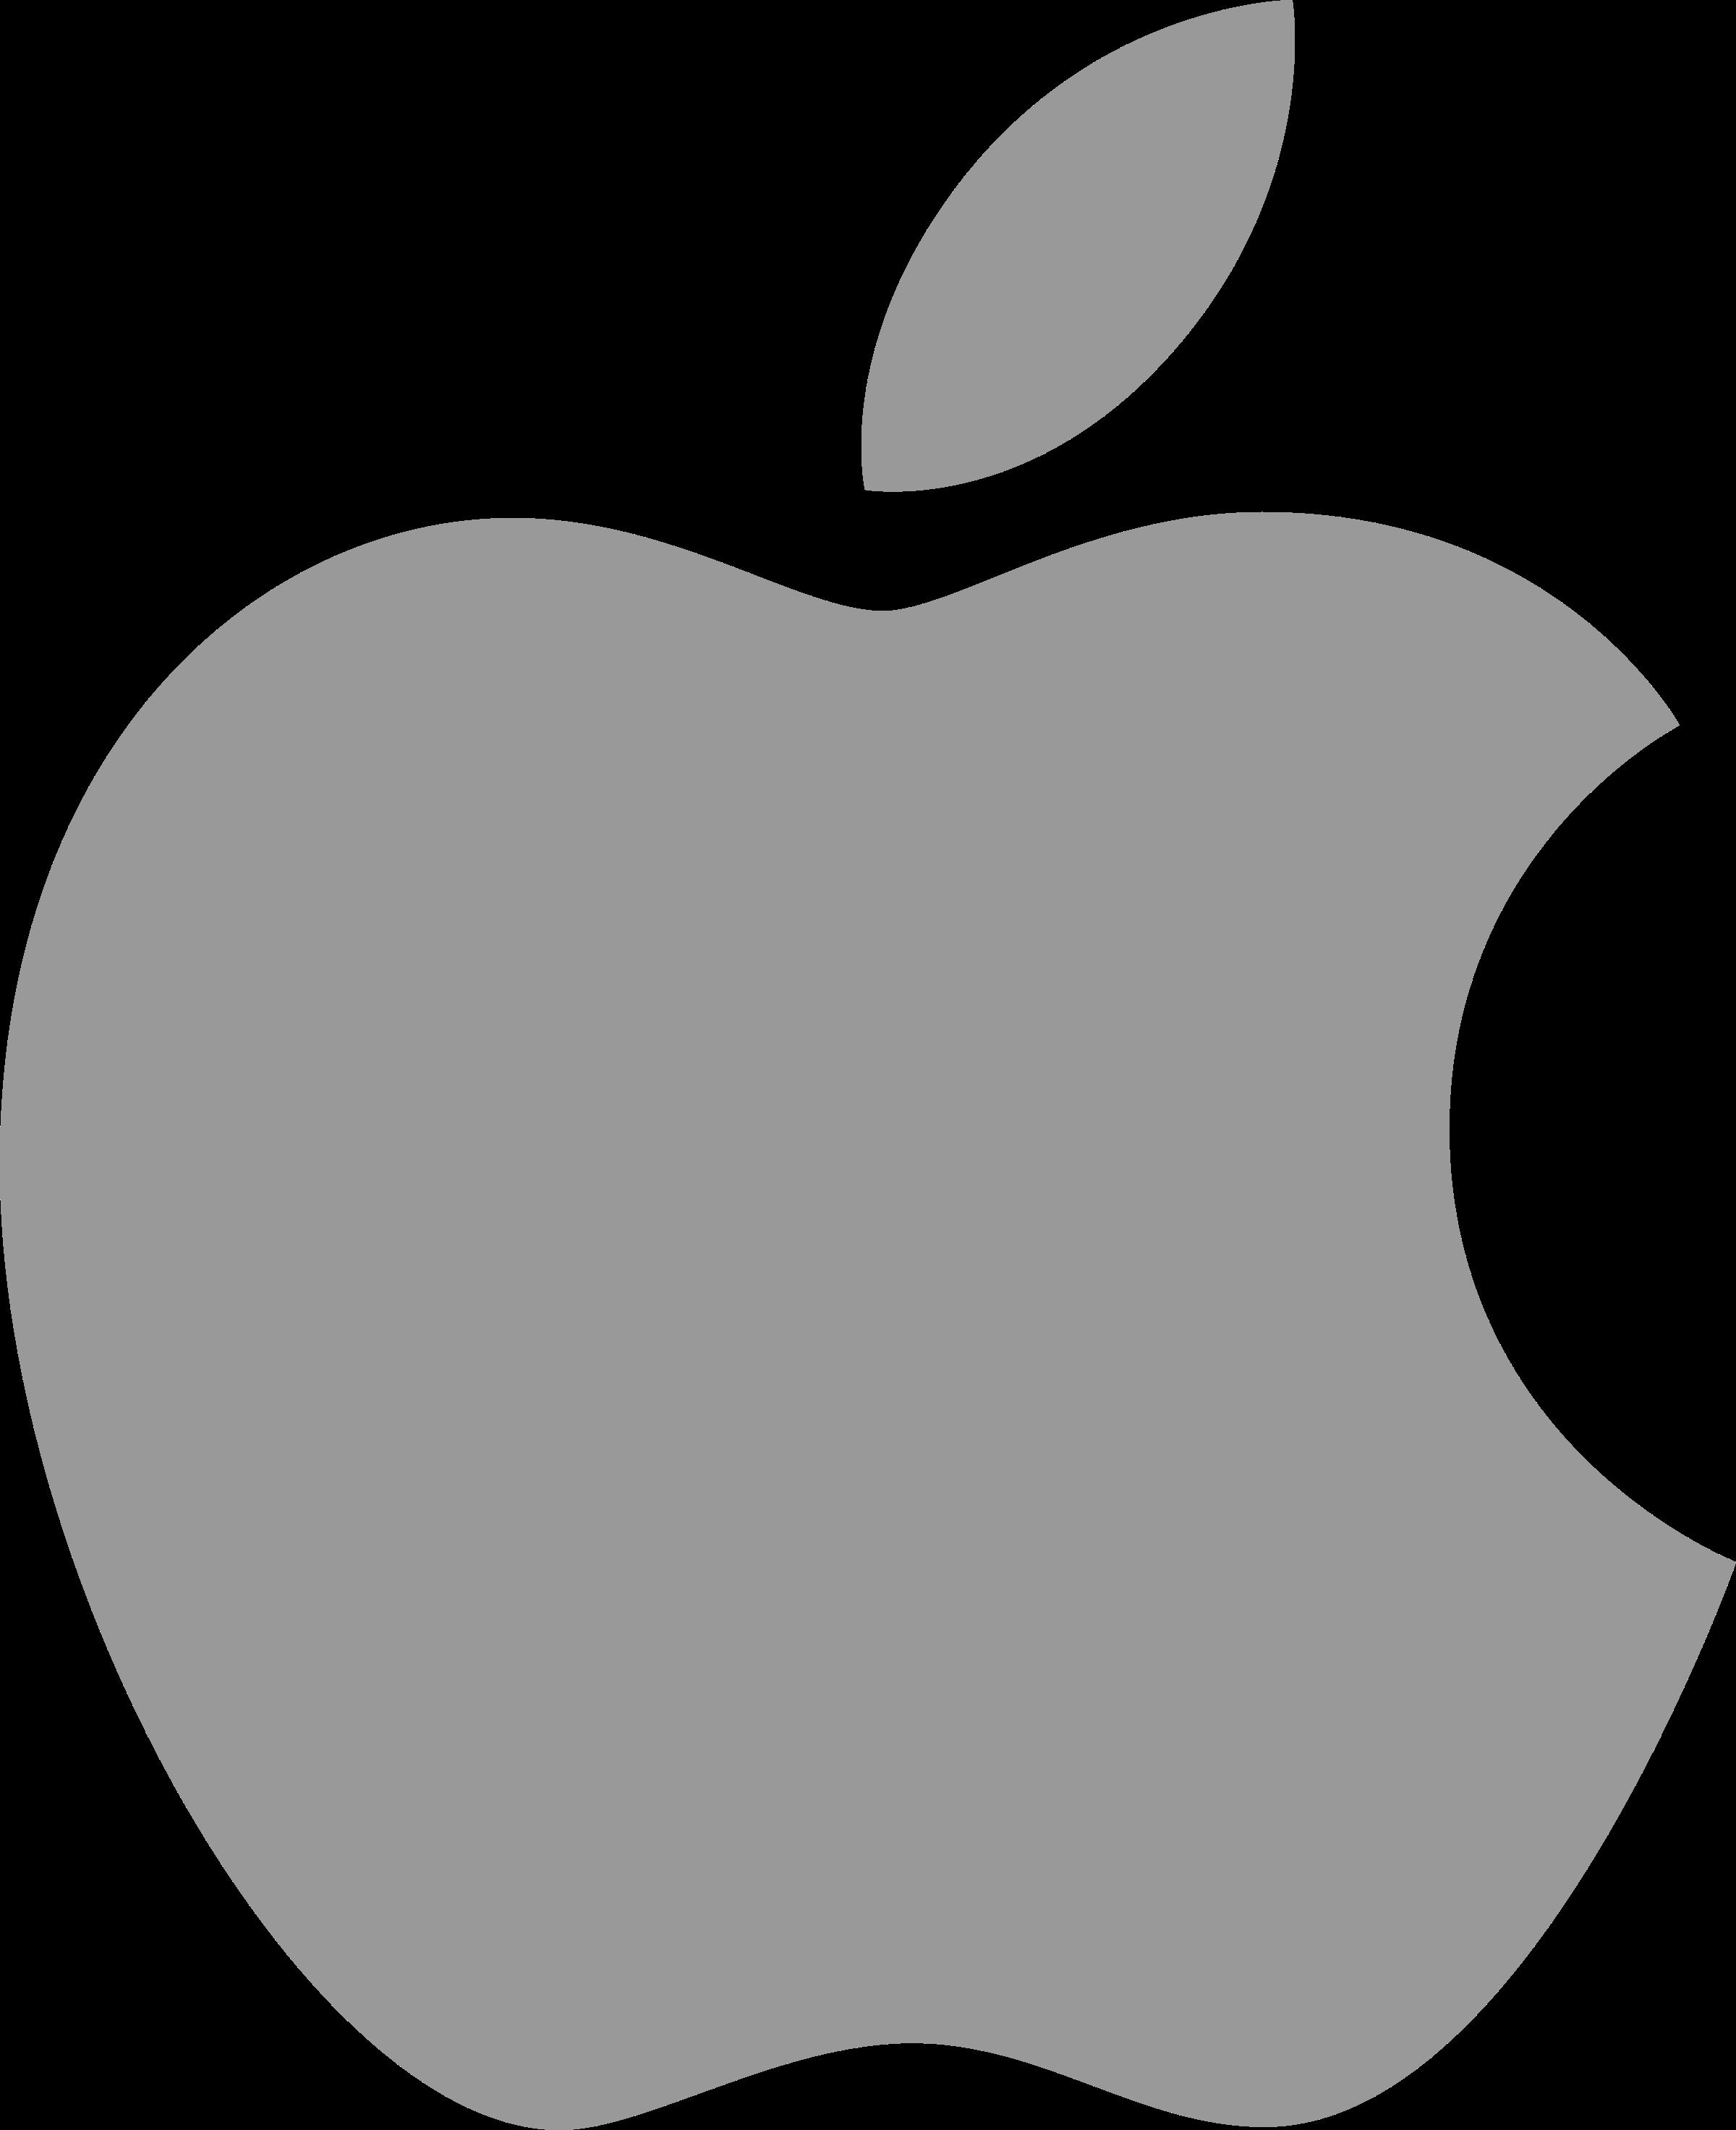 Apple Logo PNG Transparent & SVG Vector - Freebie Supply